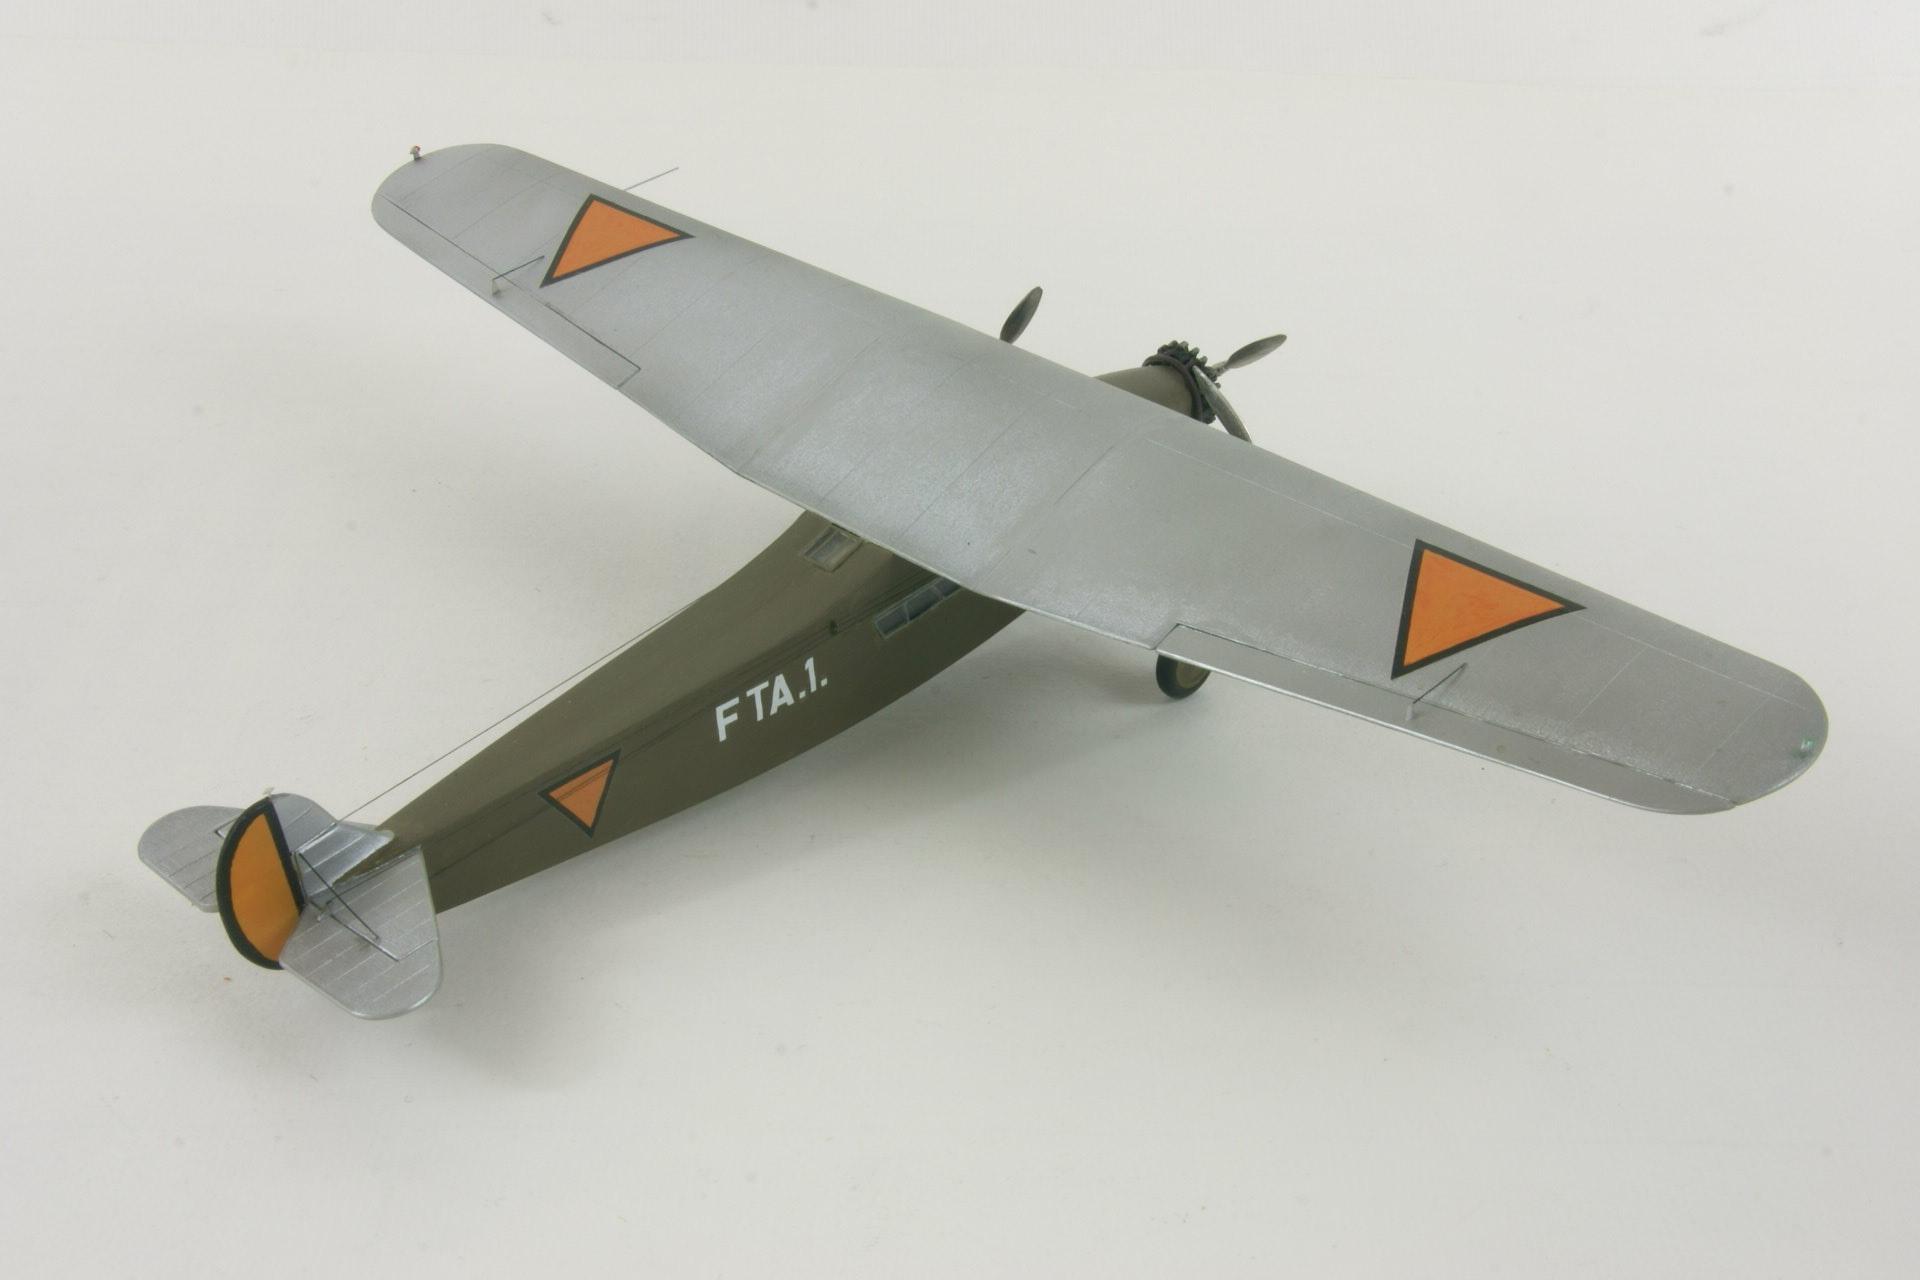 Fokker f viia 3 2